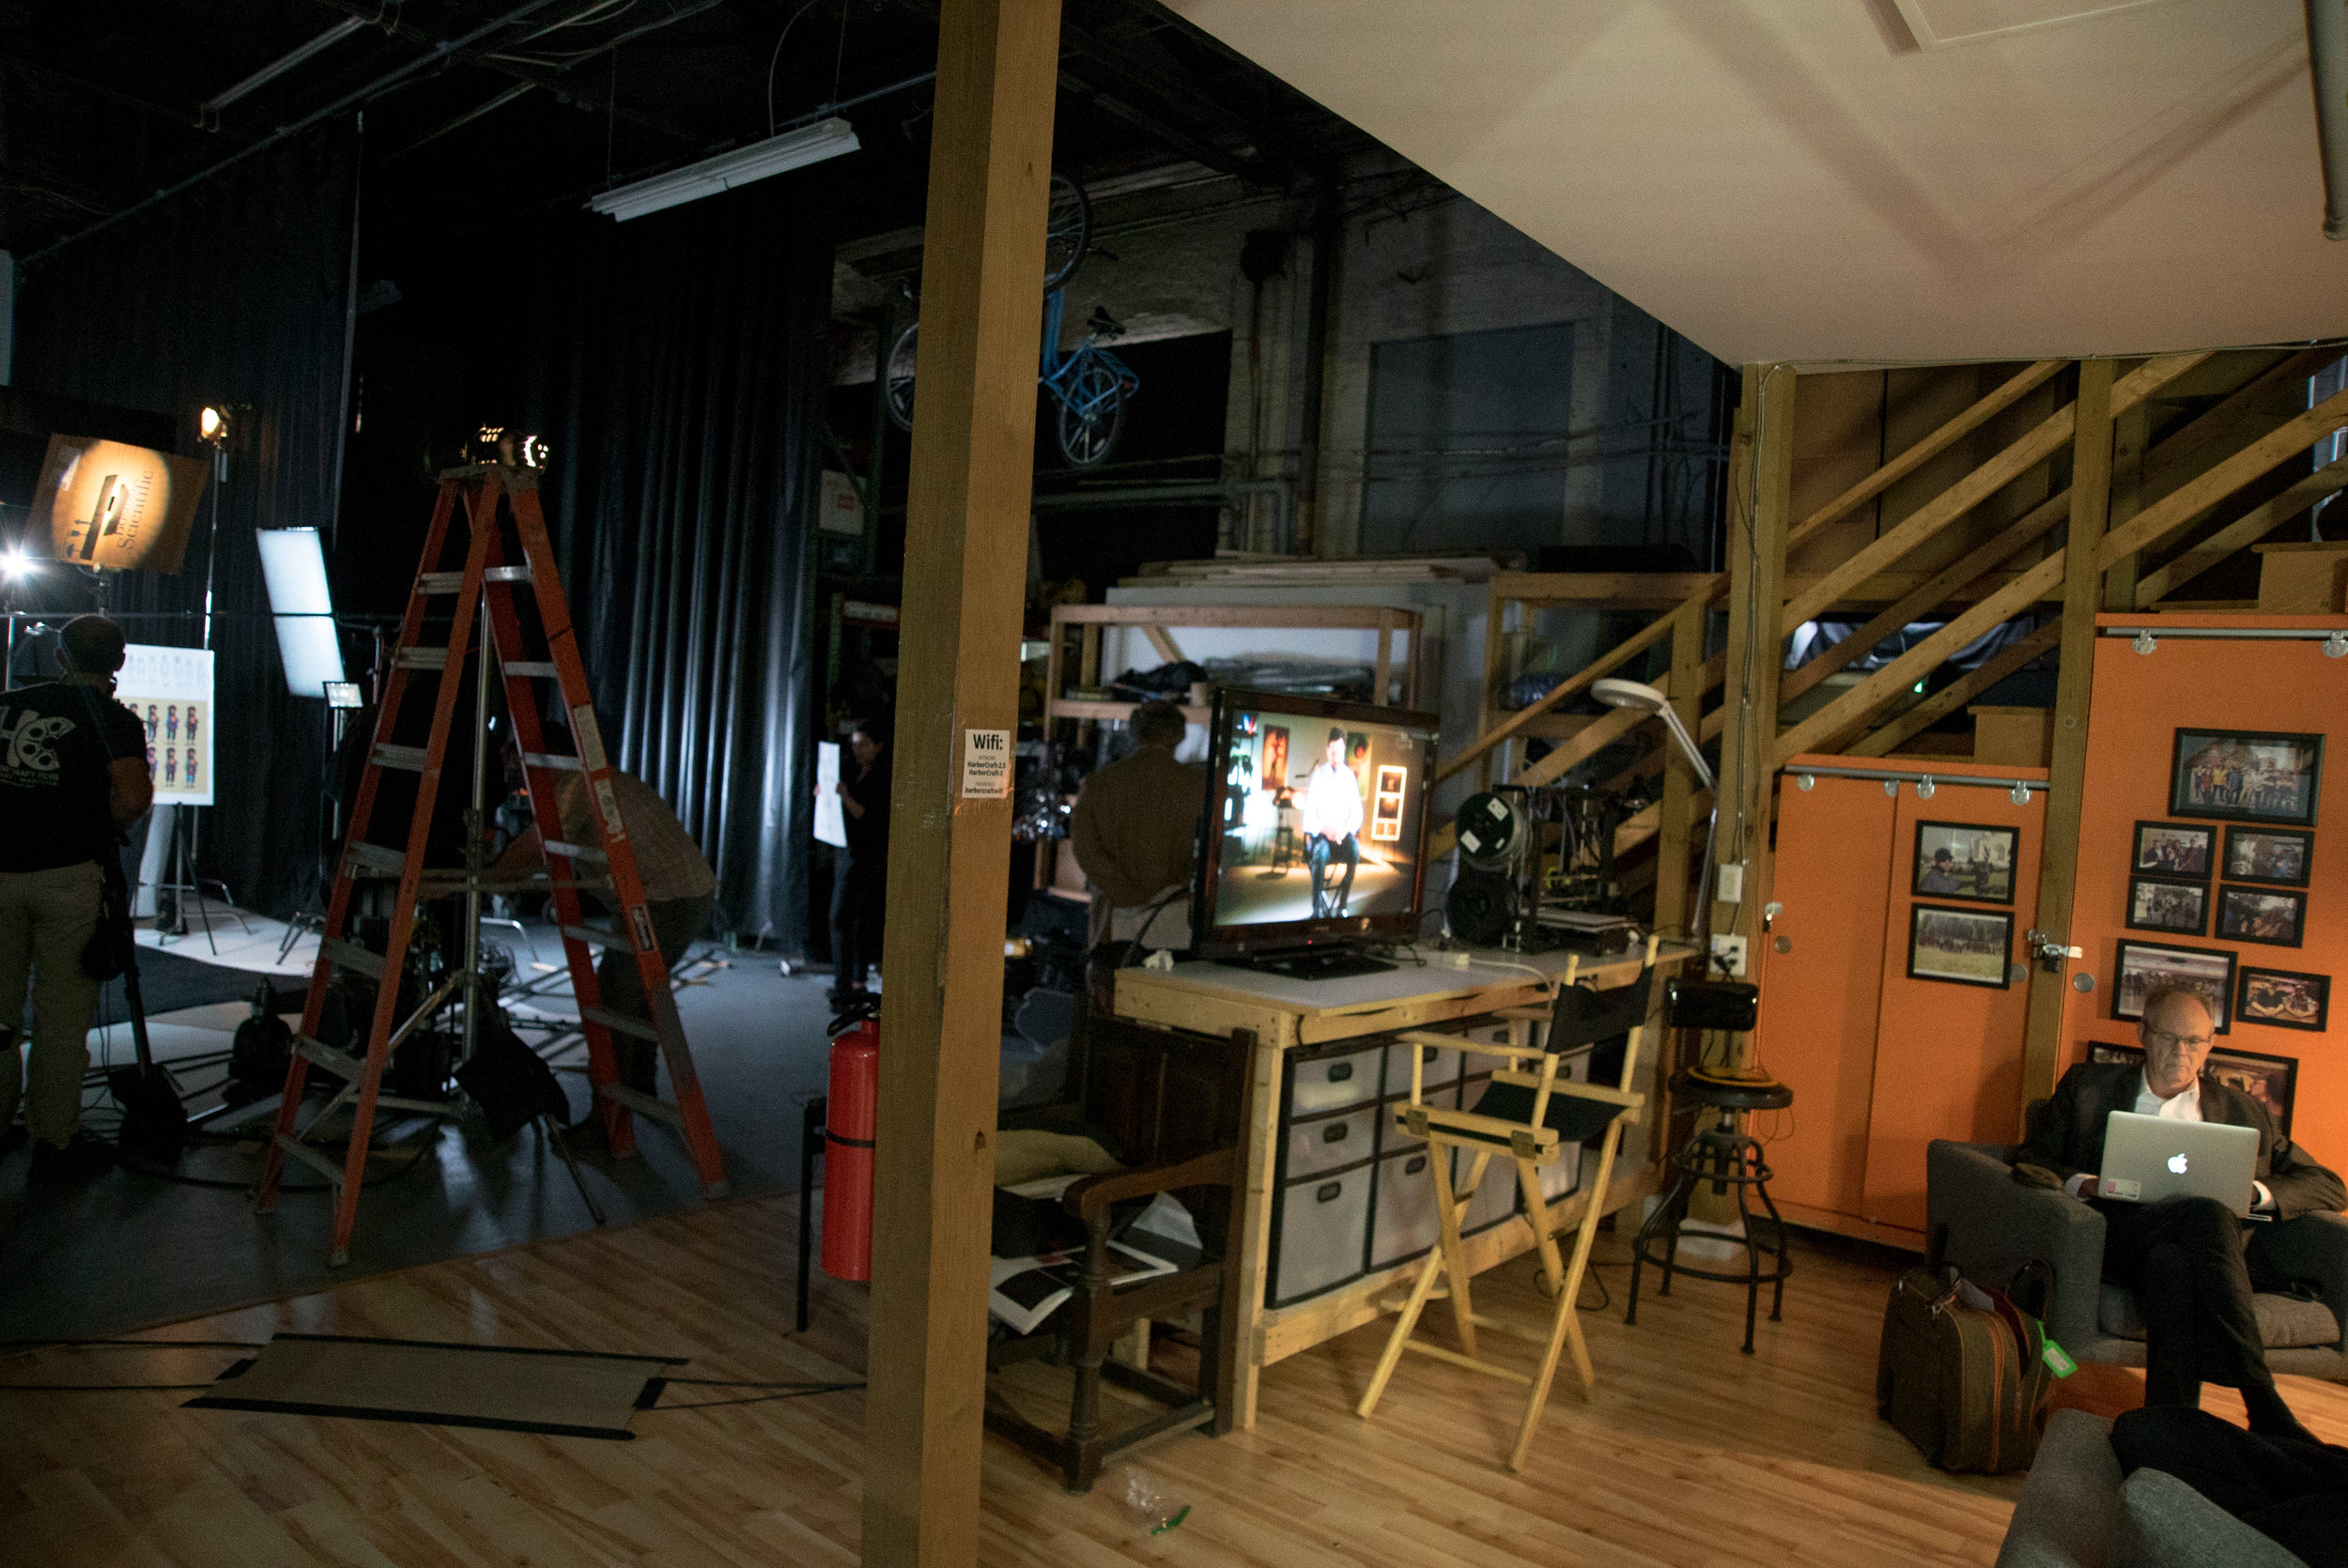 harbor craft studio 06.jpg